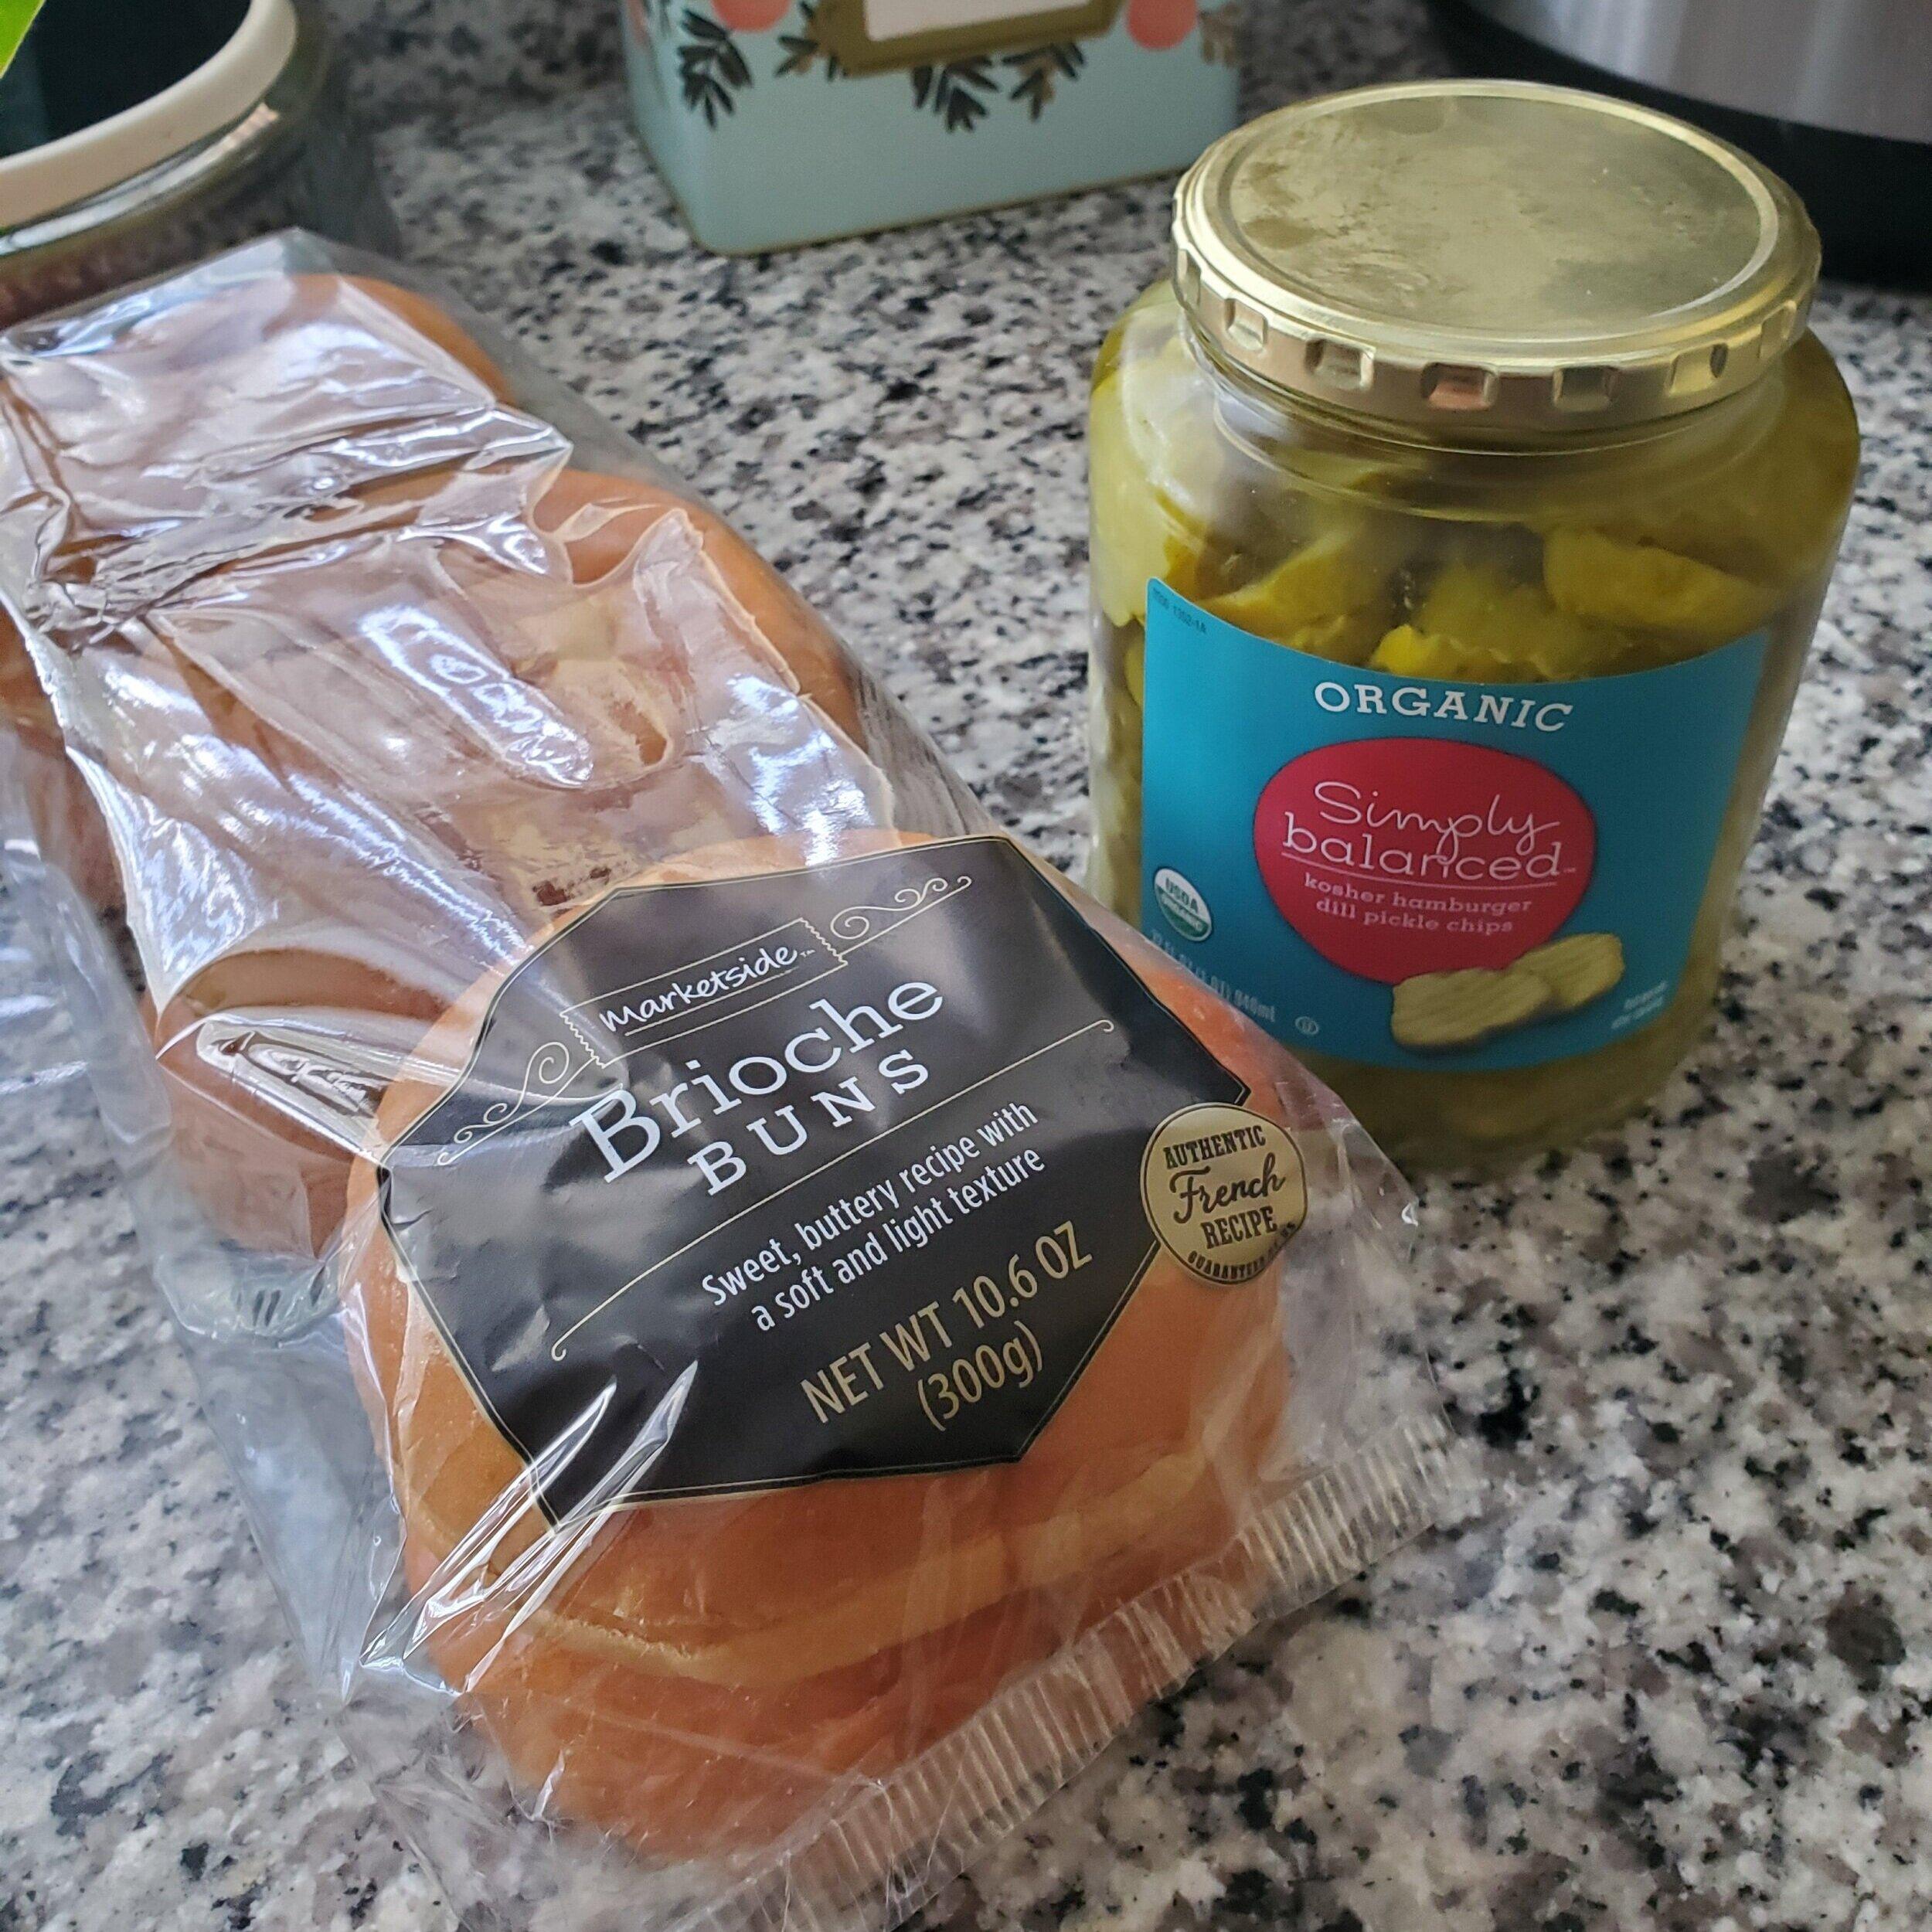 Brioche buns and dill pickle chips